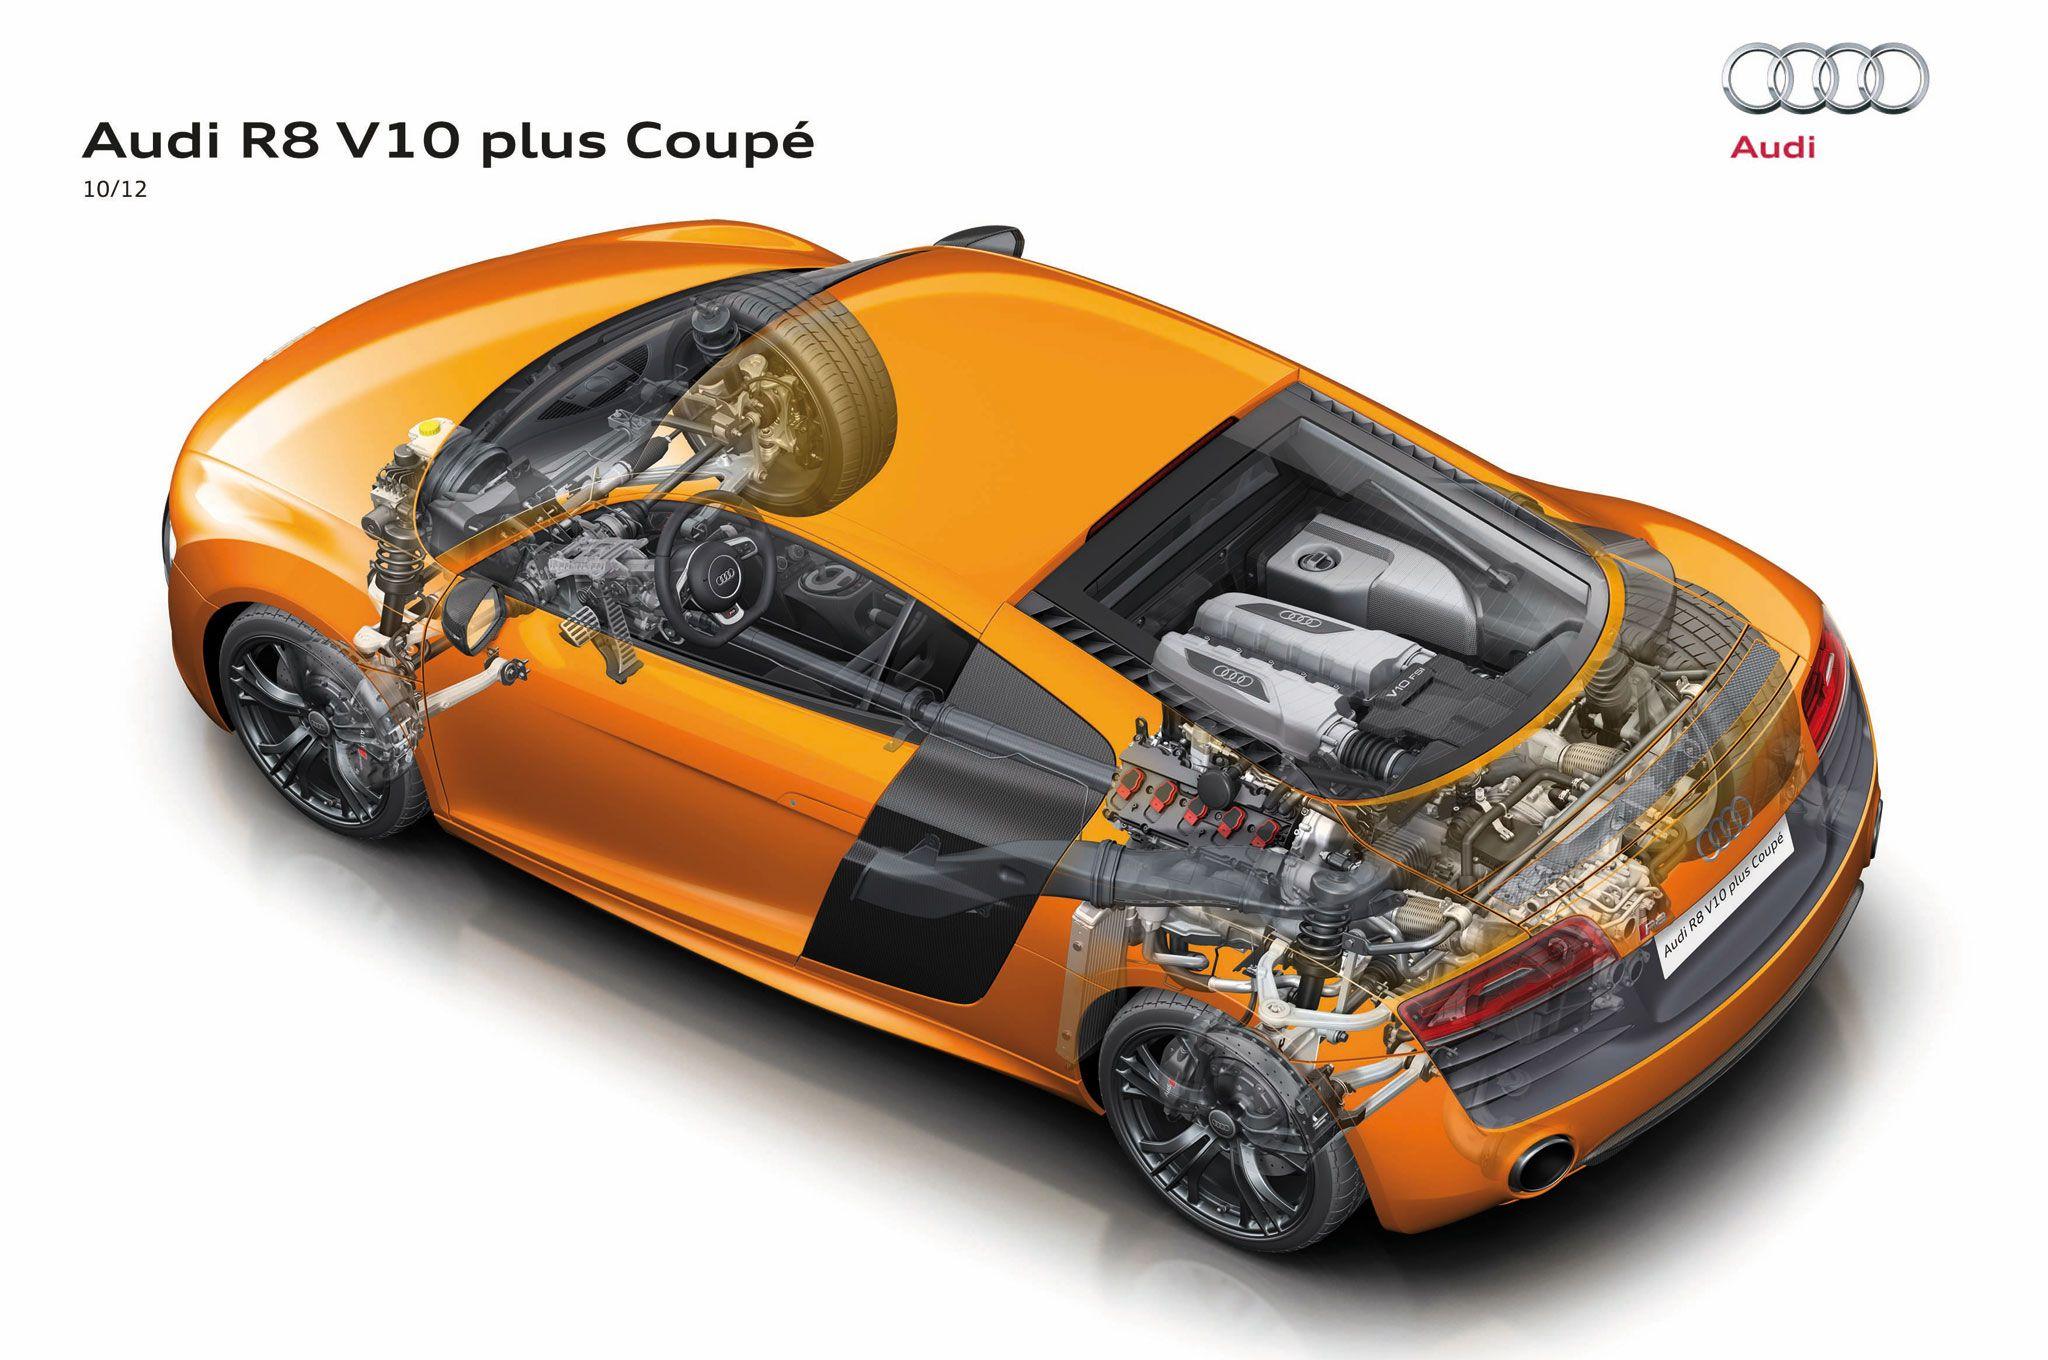 2014 Audi R8 V10 cutaway  Klassika bilar  Pinterest  Audi r8